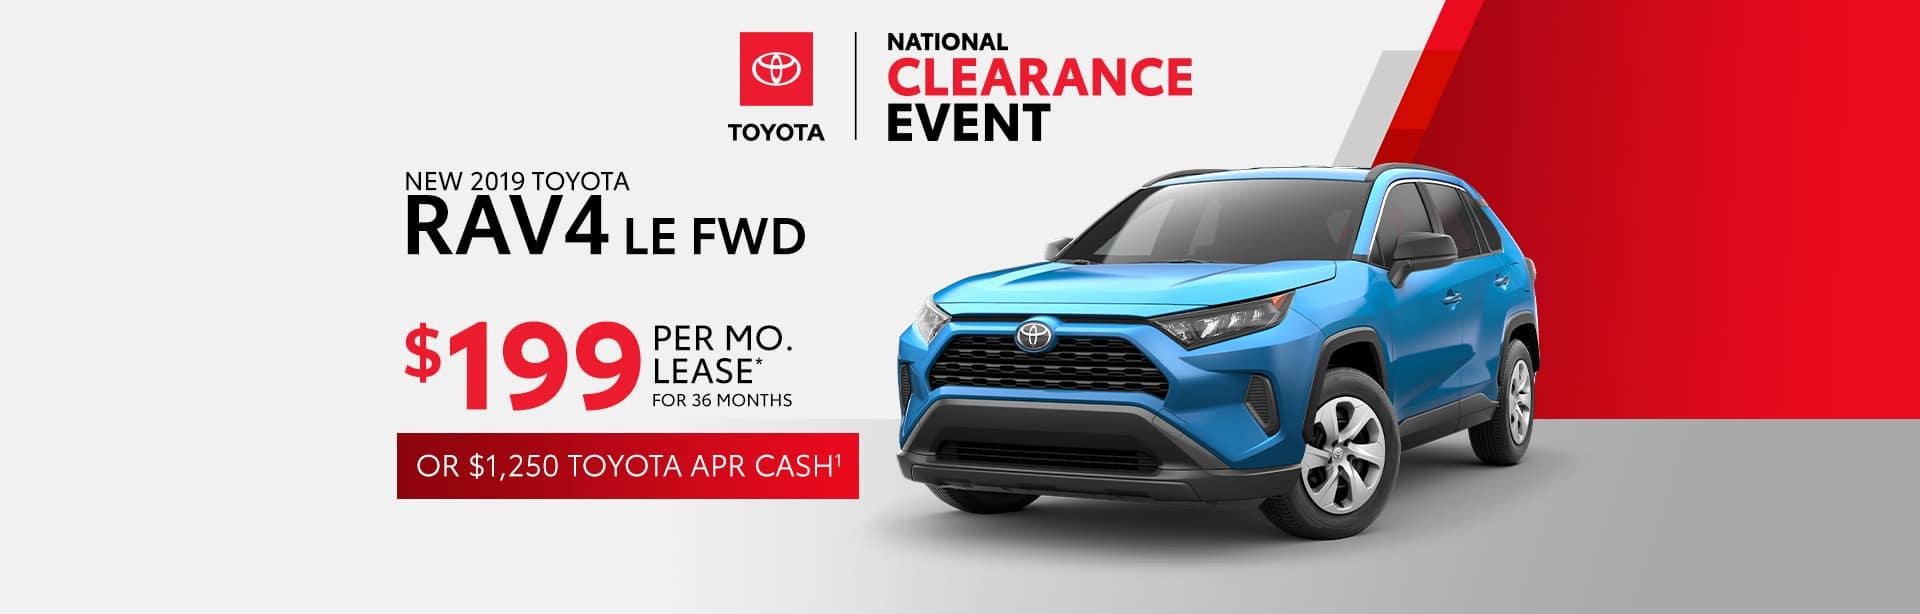 Toyota Columbus Ohio >> Carver Toyota Toyota Dealer In Taylorsville Serving Columbus